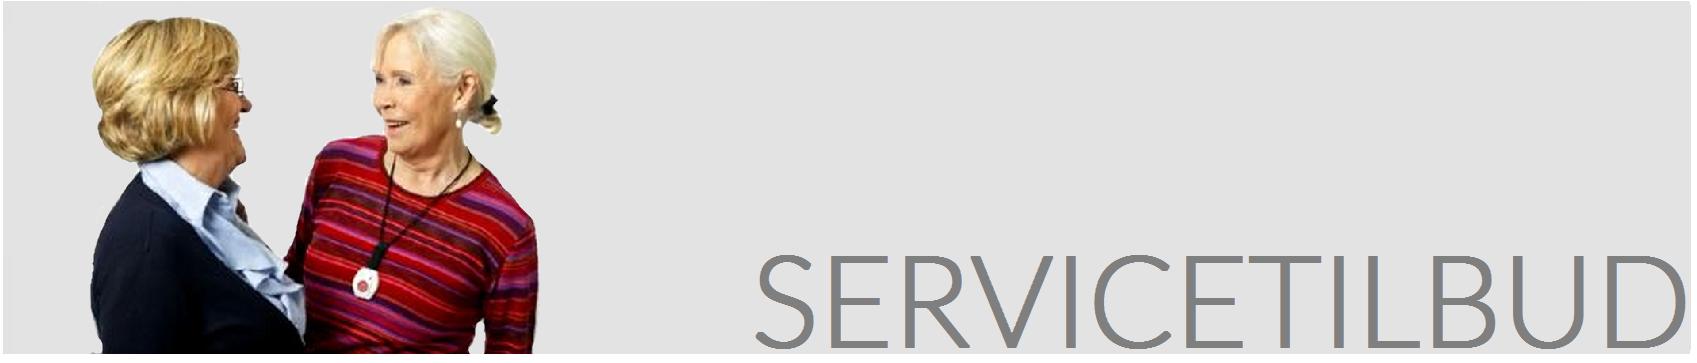 Servicetilbud